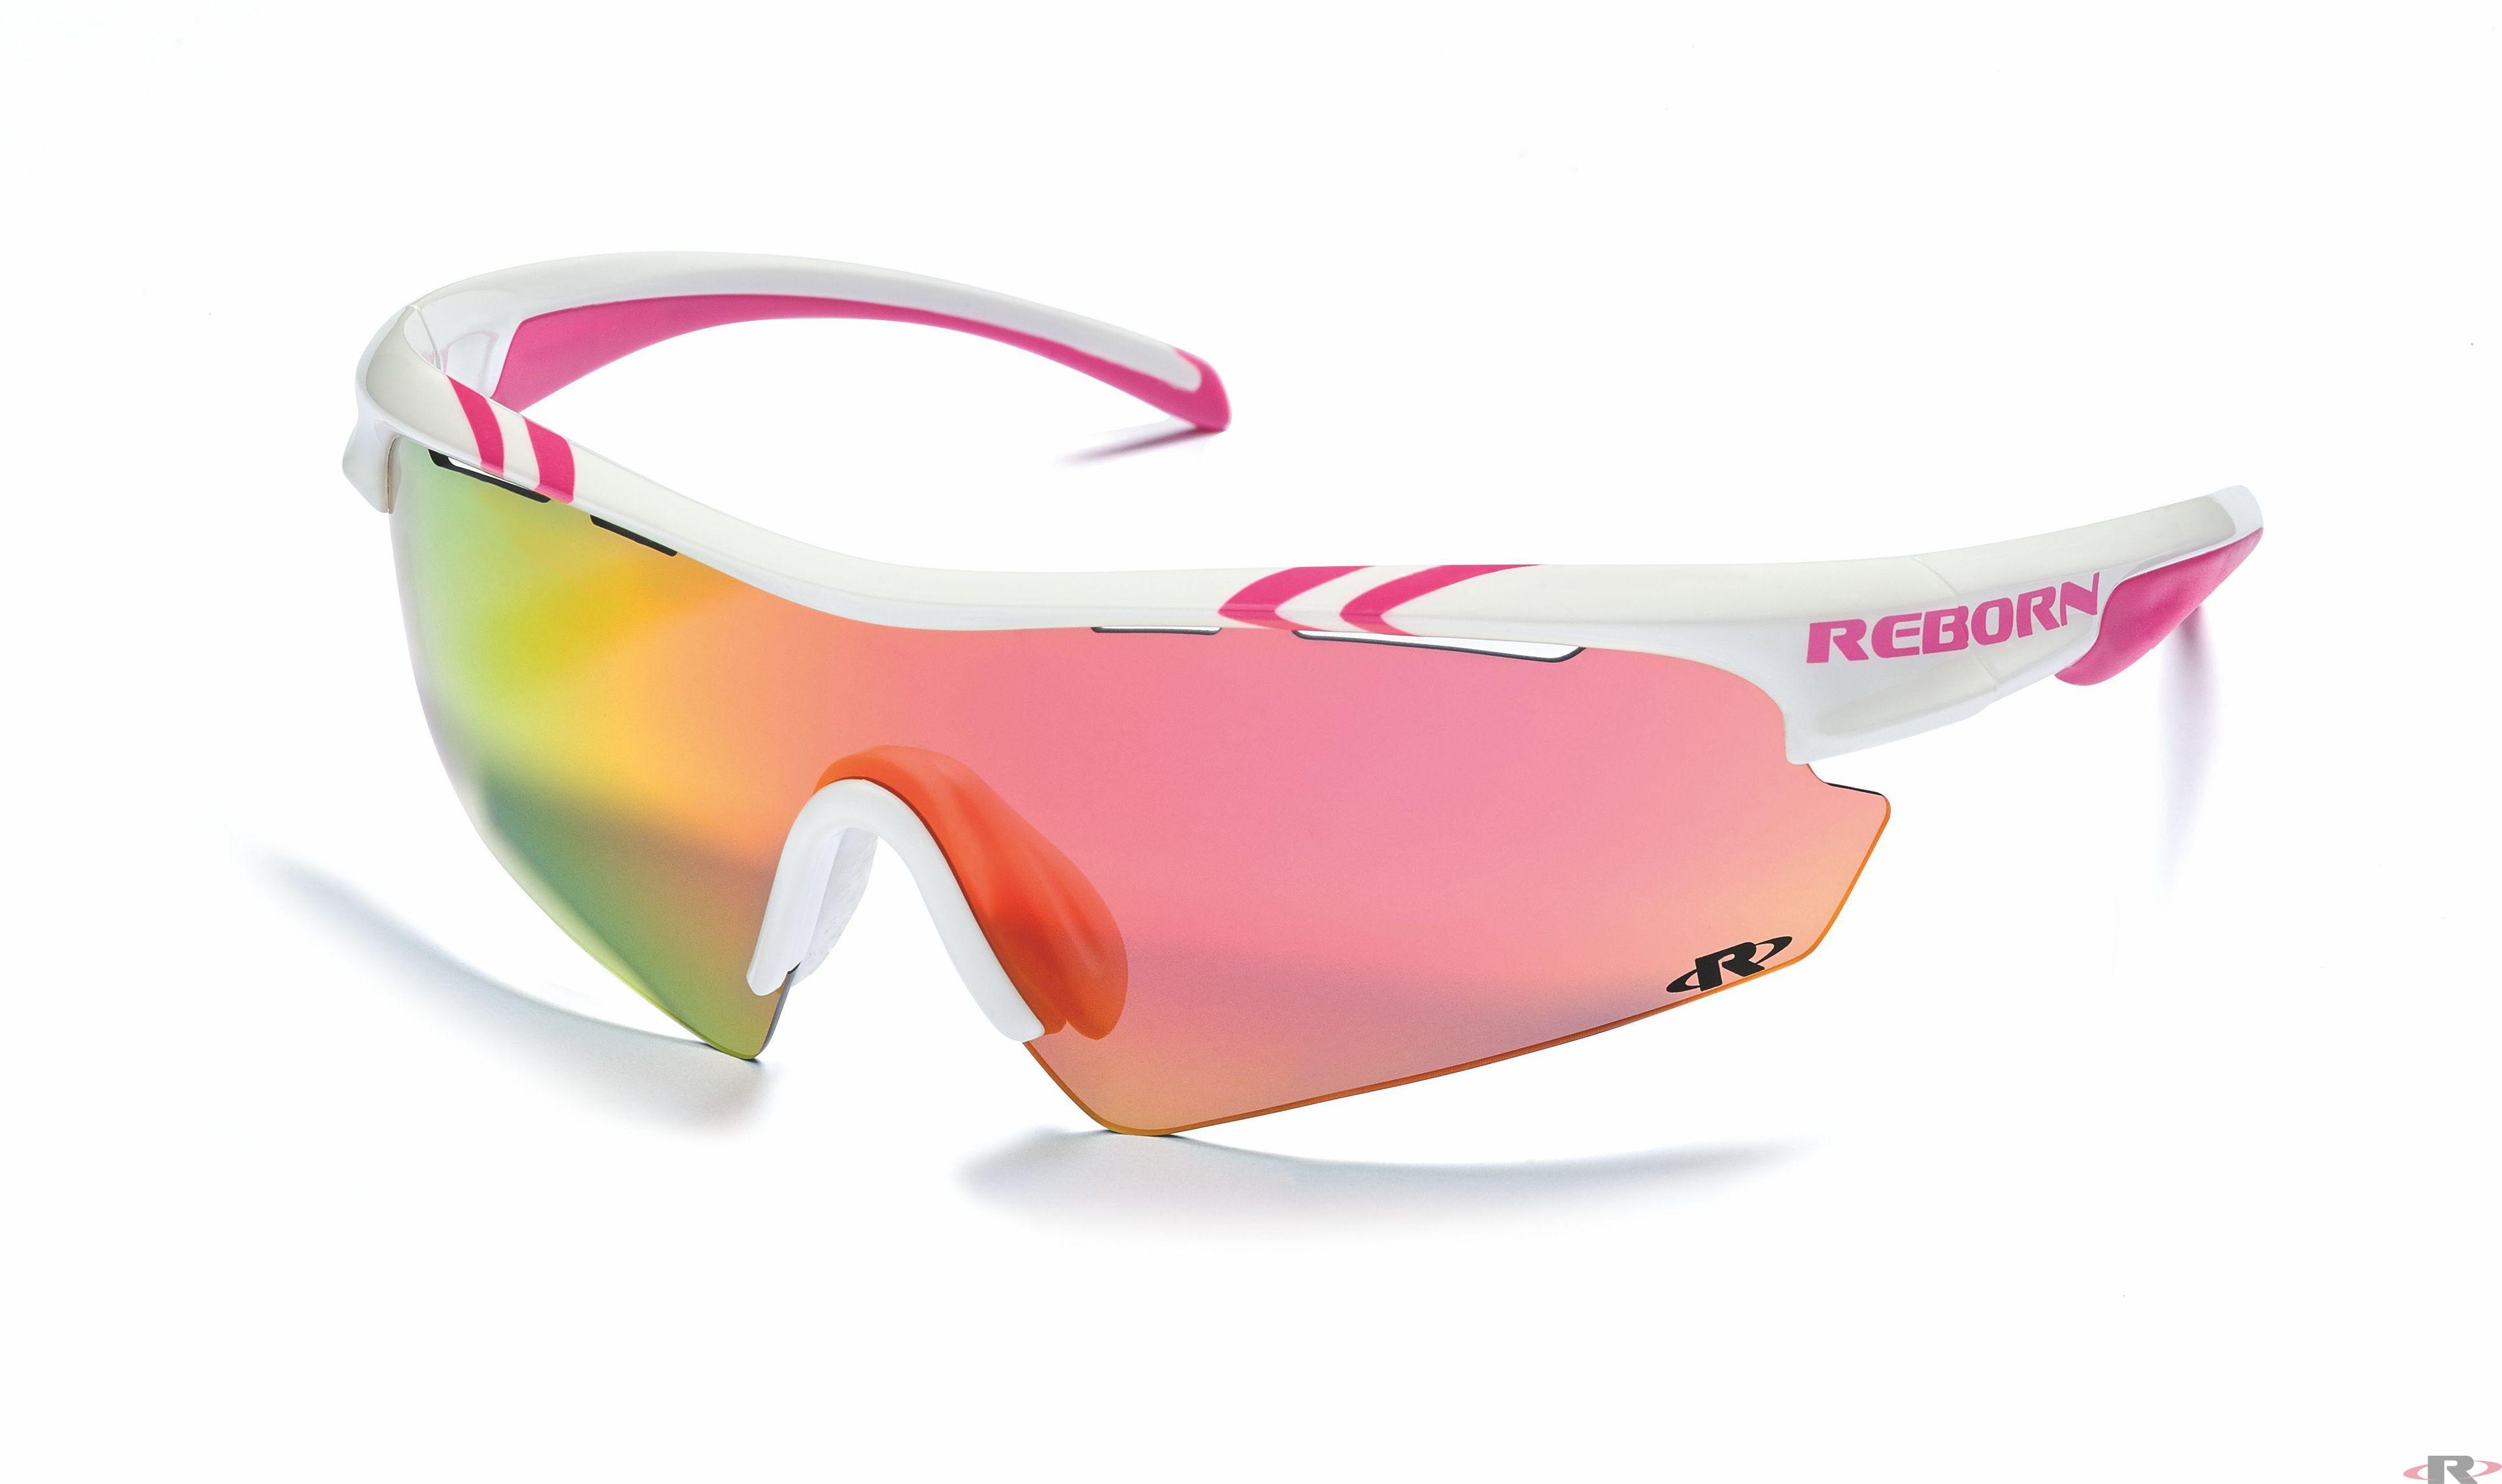 X-PRO weiss-pink / revo pink